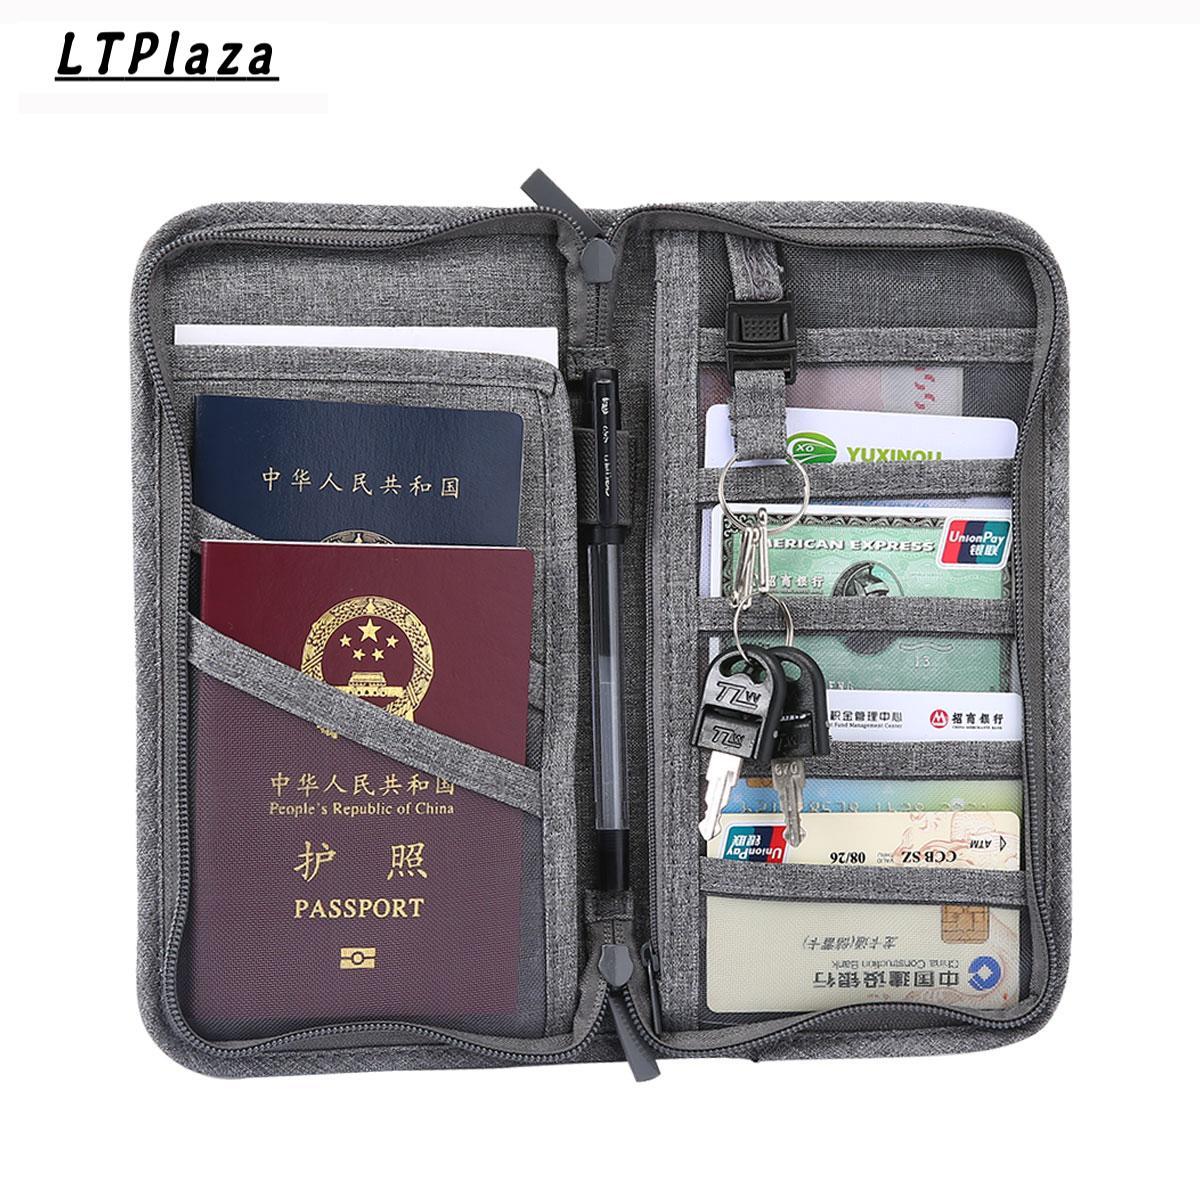 4fcdf5bad3e Multi-functional Travel Passport Wallet Polyester Passport Holder Travel  Card Storage Bag Key Pencil Ticket